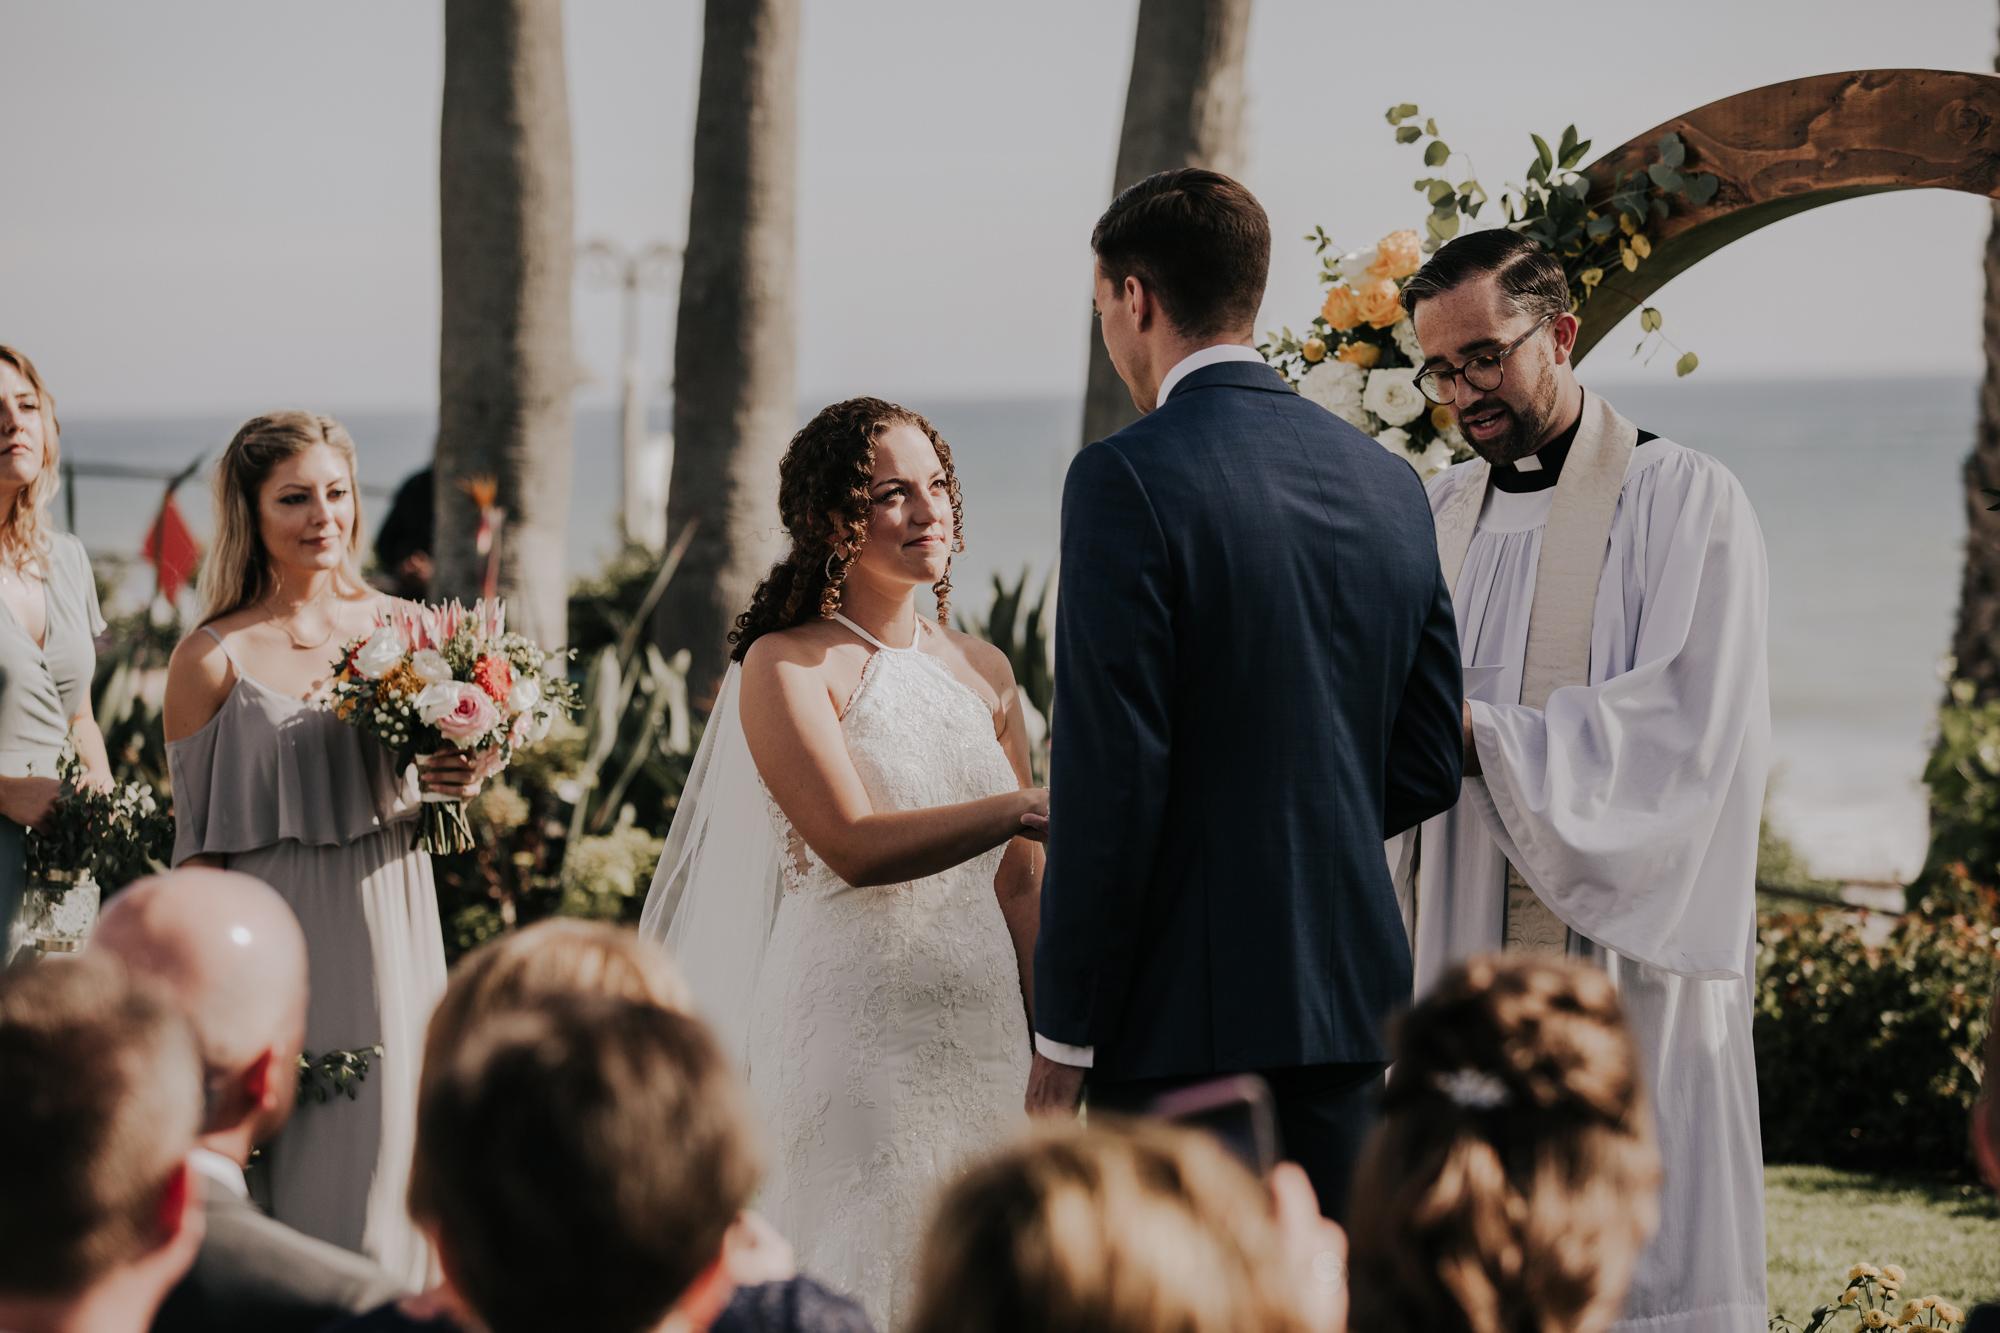 089-destination-wedding-san-clemente-california.jpg